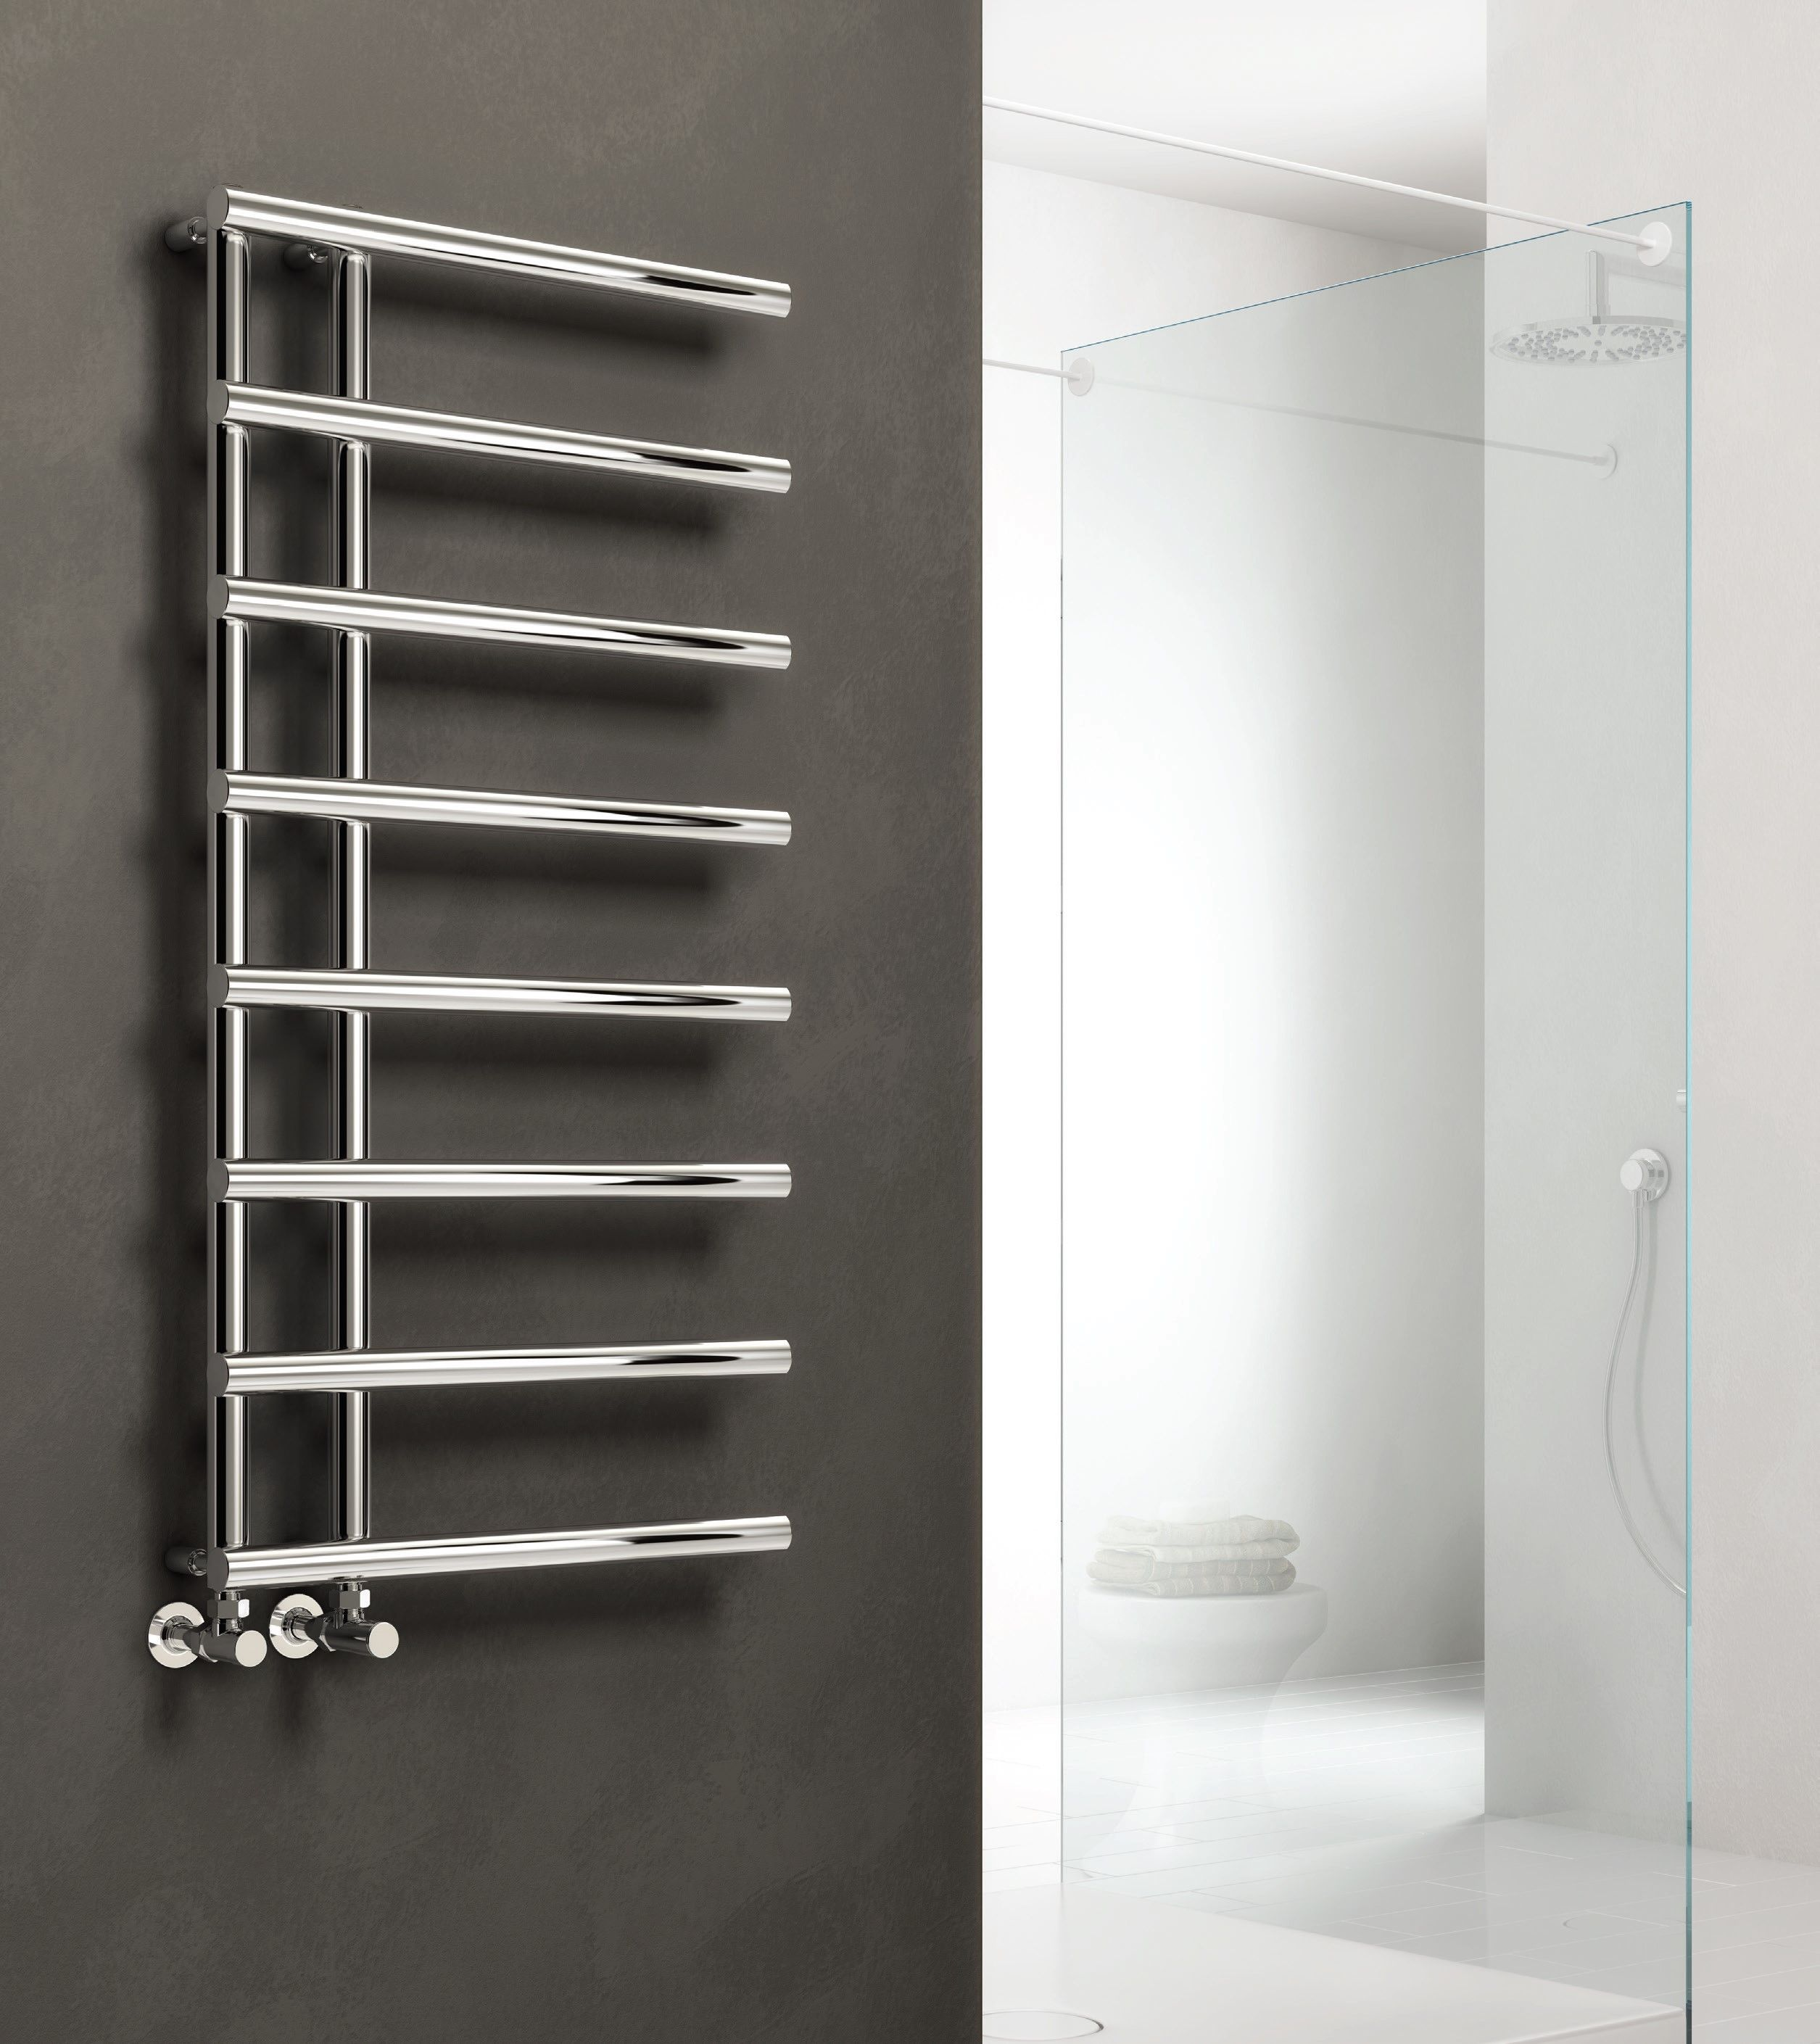 Details About Modern Designer Chrome Straight Round Heated Towel Rail Bathroom Radiator Reina Towel Radiator Bathroom Radiators Bathroom Sink Design